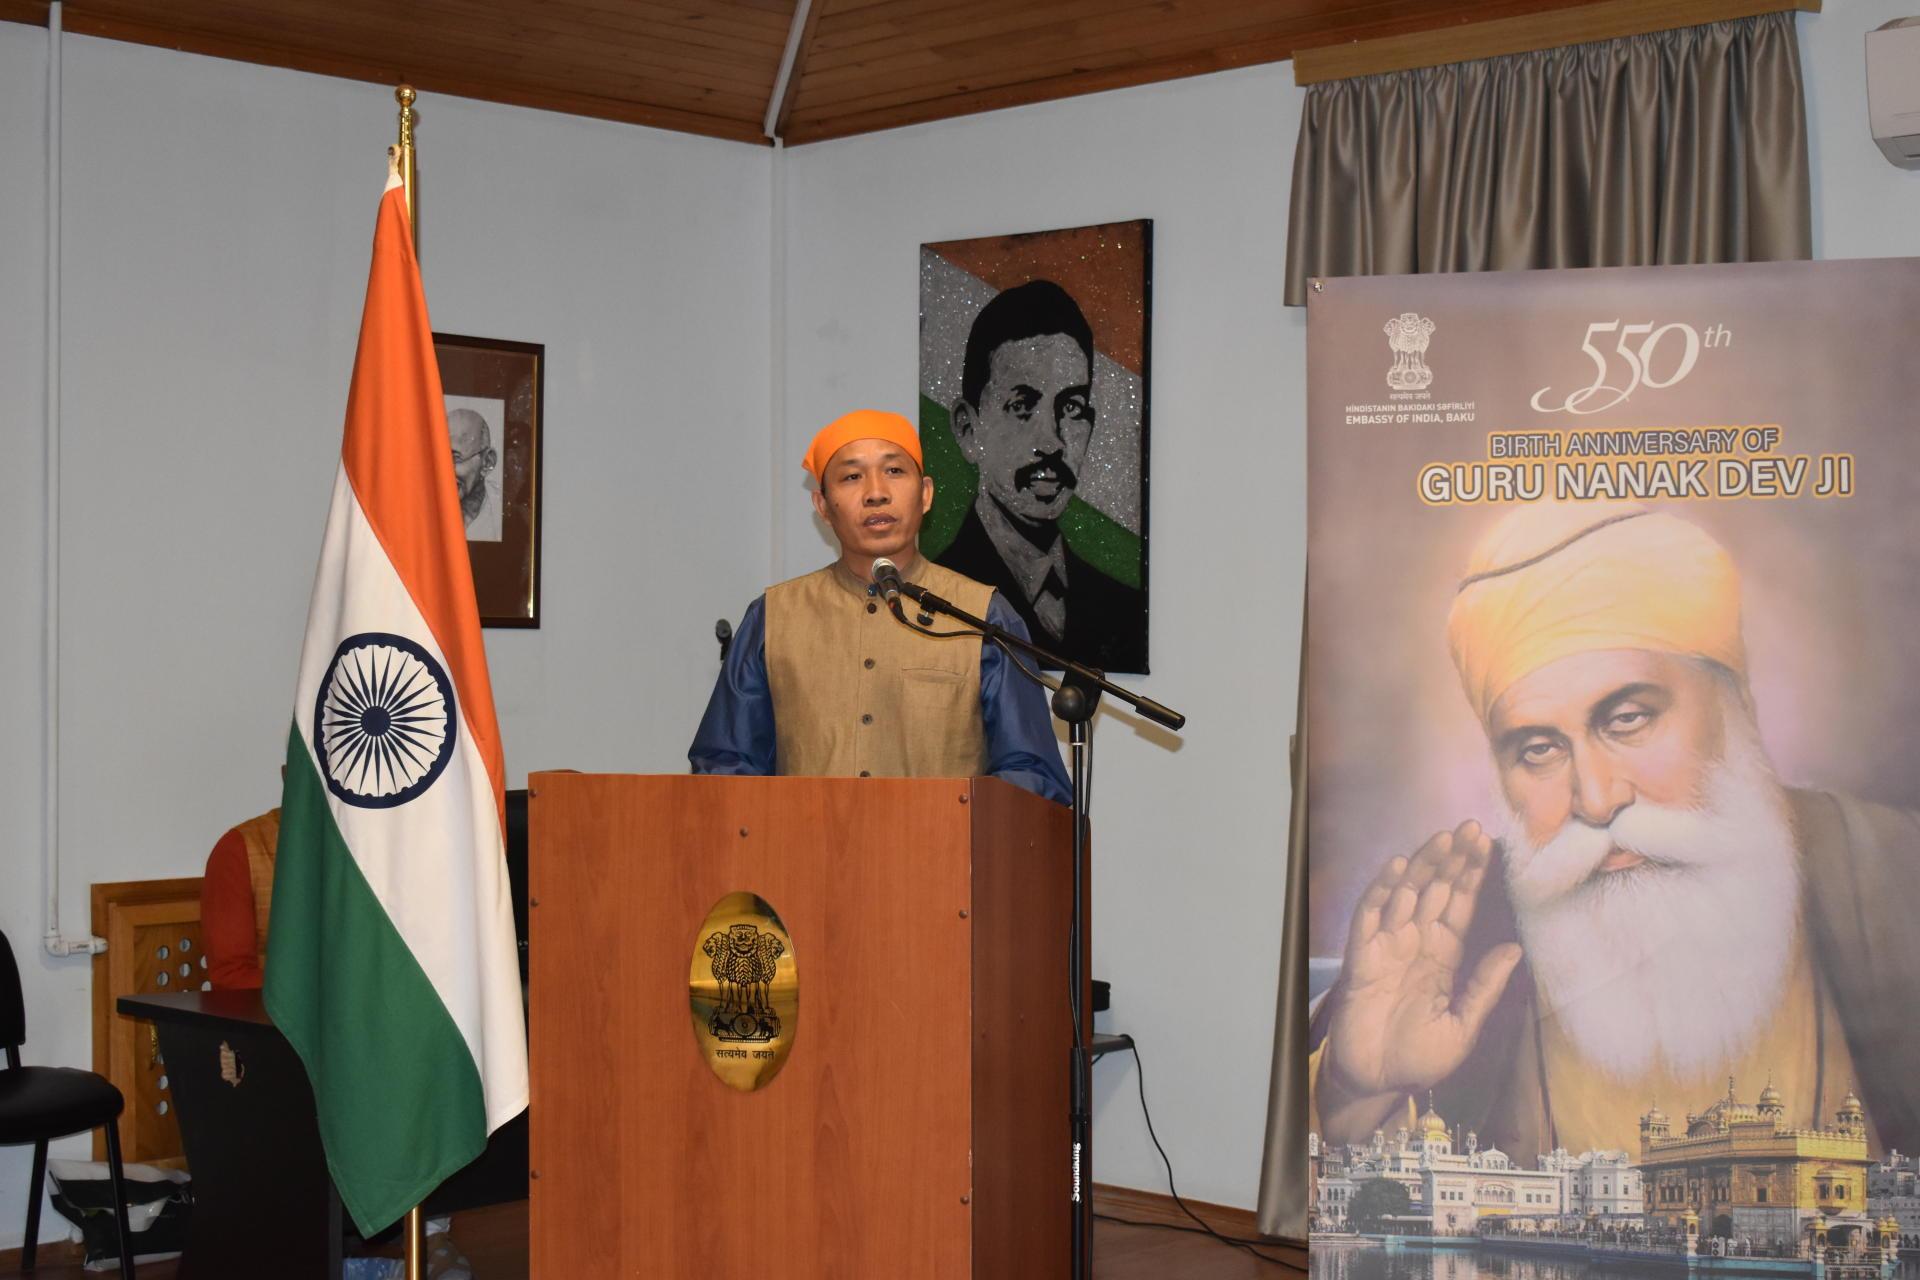 Embassy of India celebrates 550th Birth Anniversary of Guru Nanak Devji (PHOTO) - Gallery Image